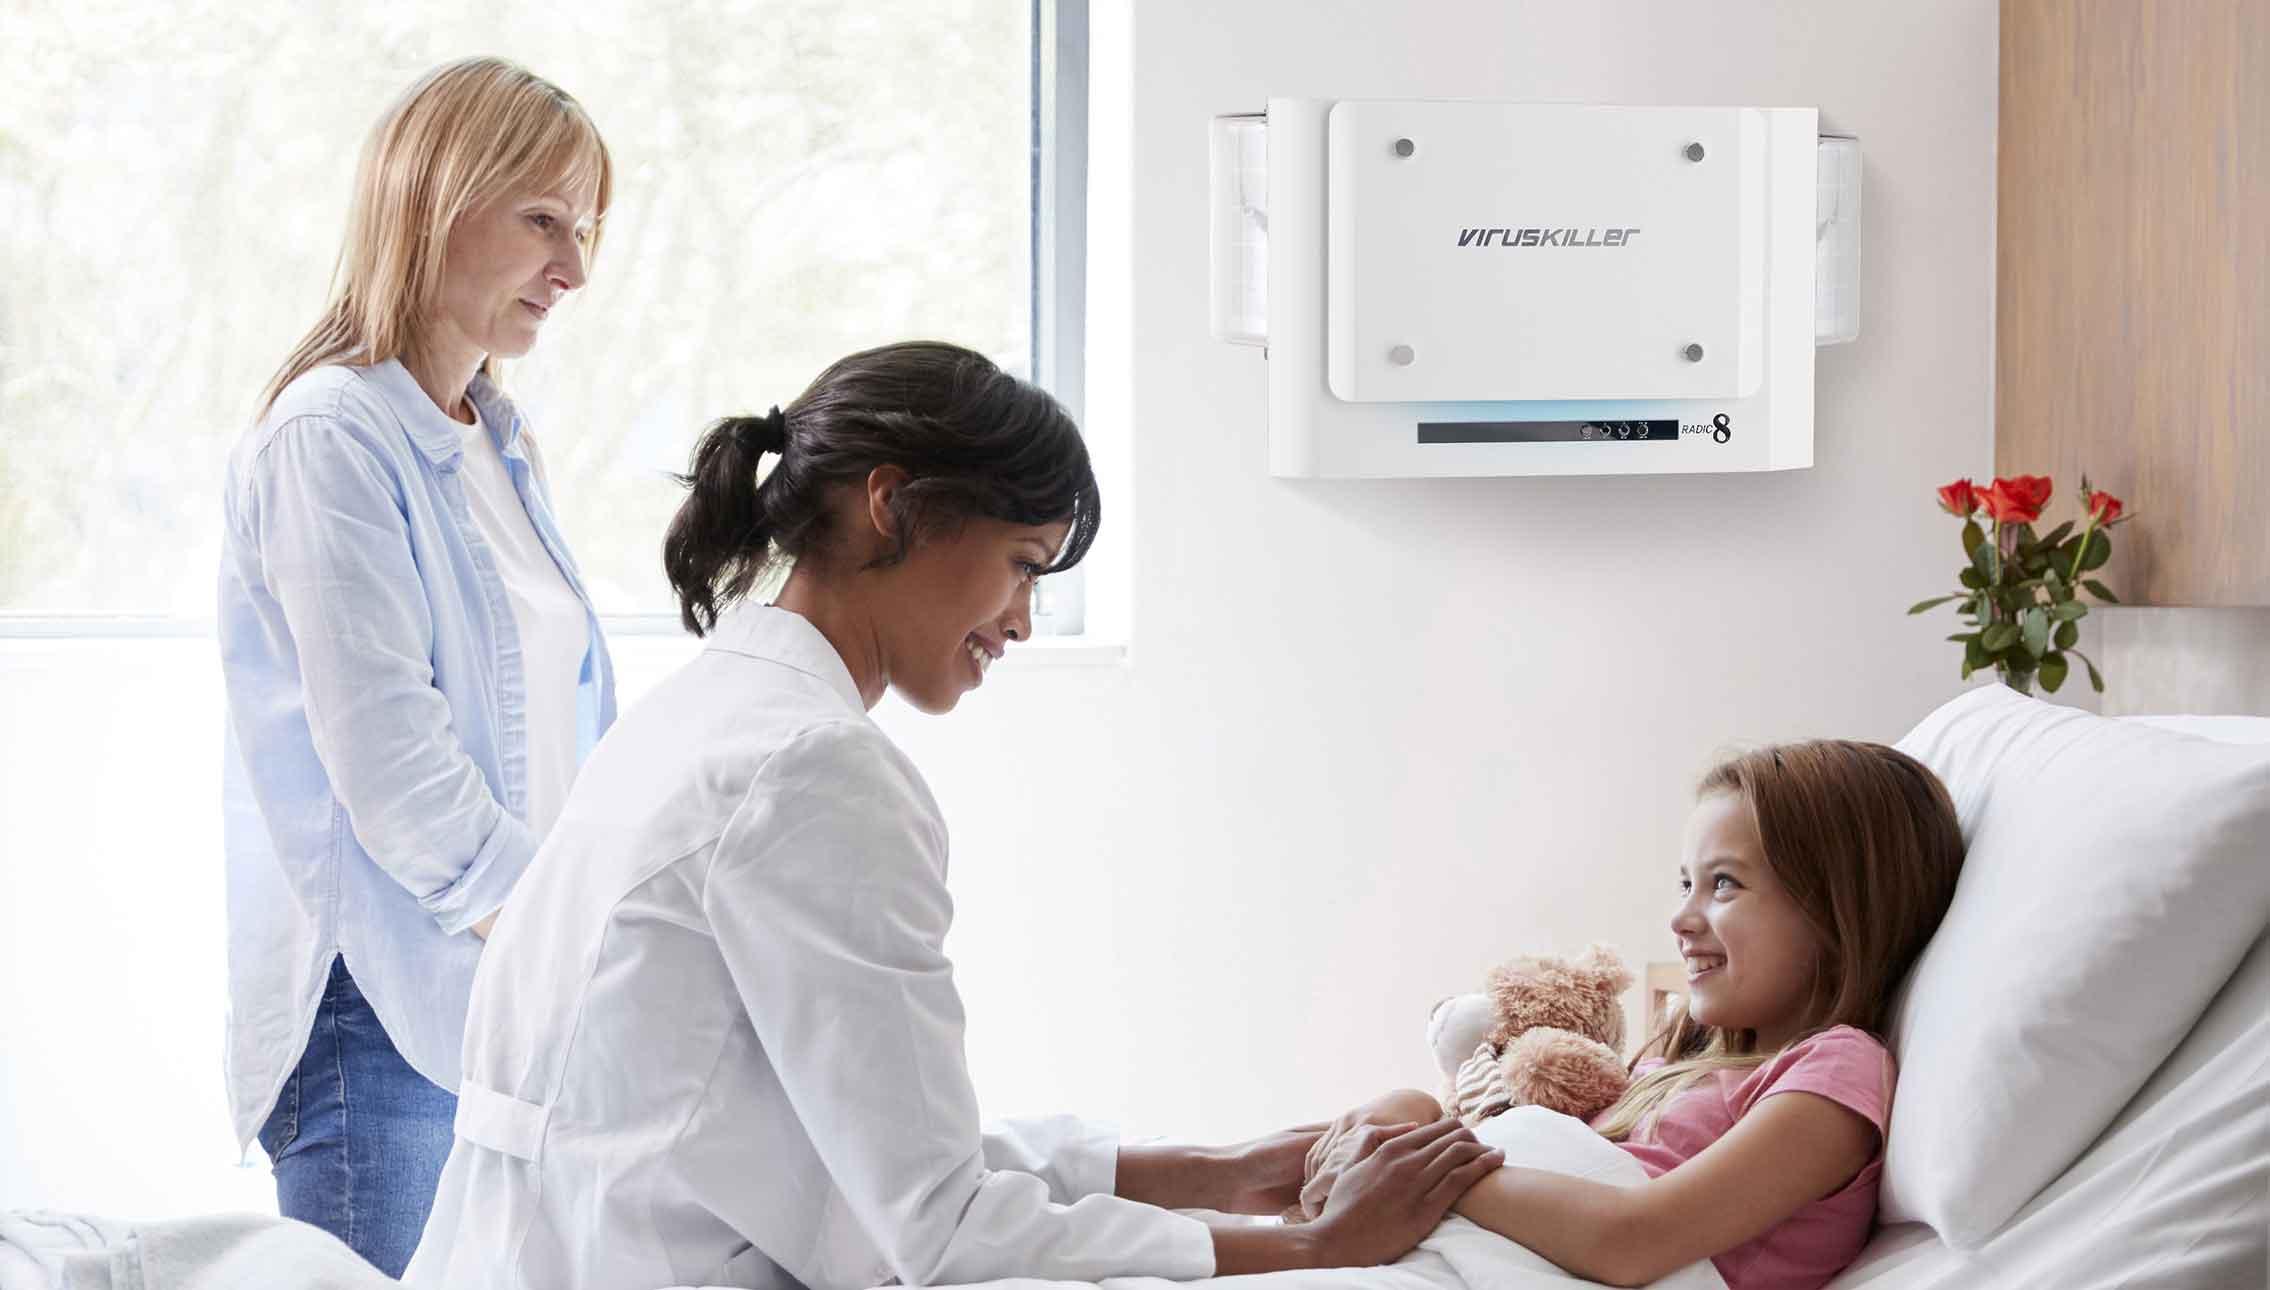 Radic8 indoor air quality in hospitals